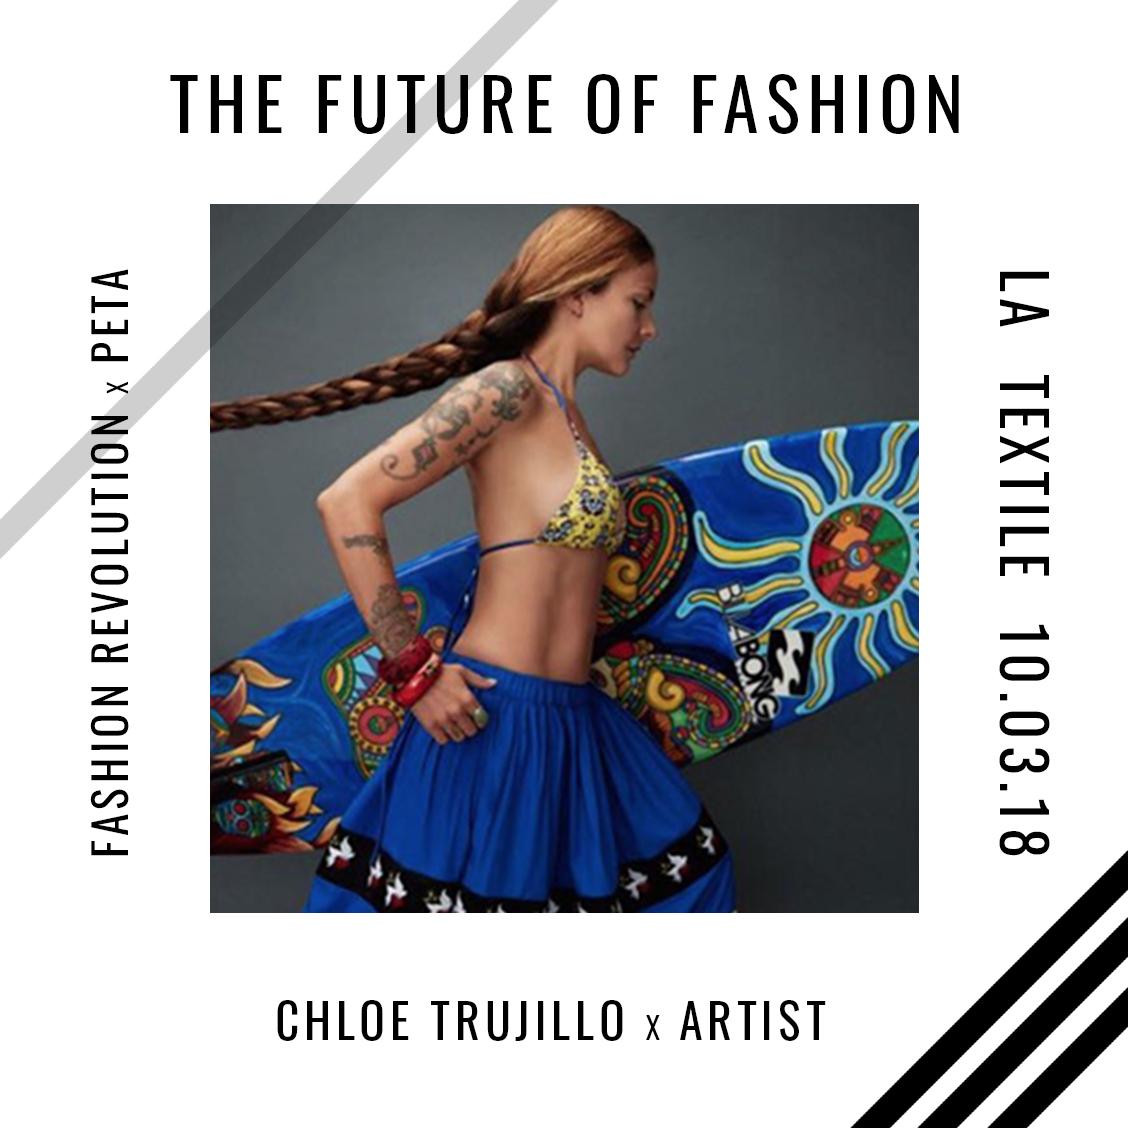 Insta_Template_TFOF_Chloe.jpg